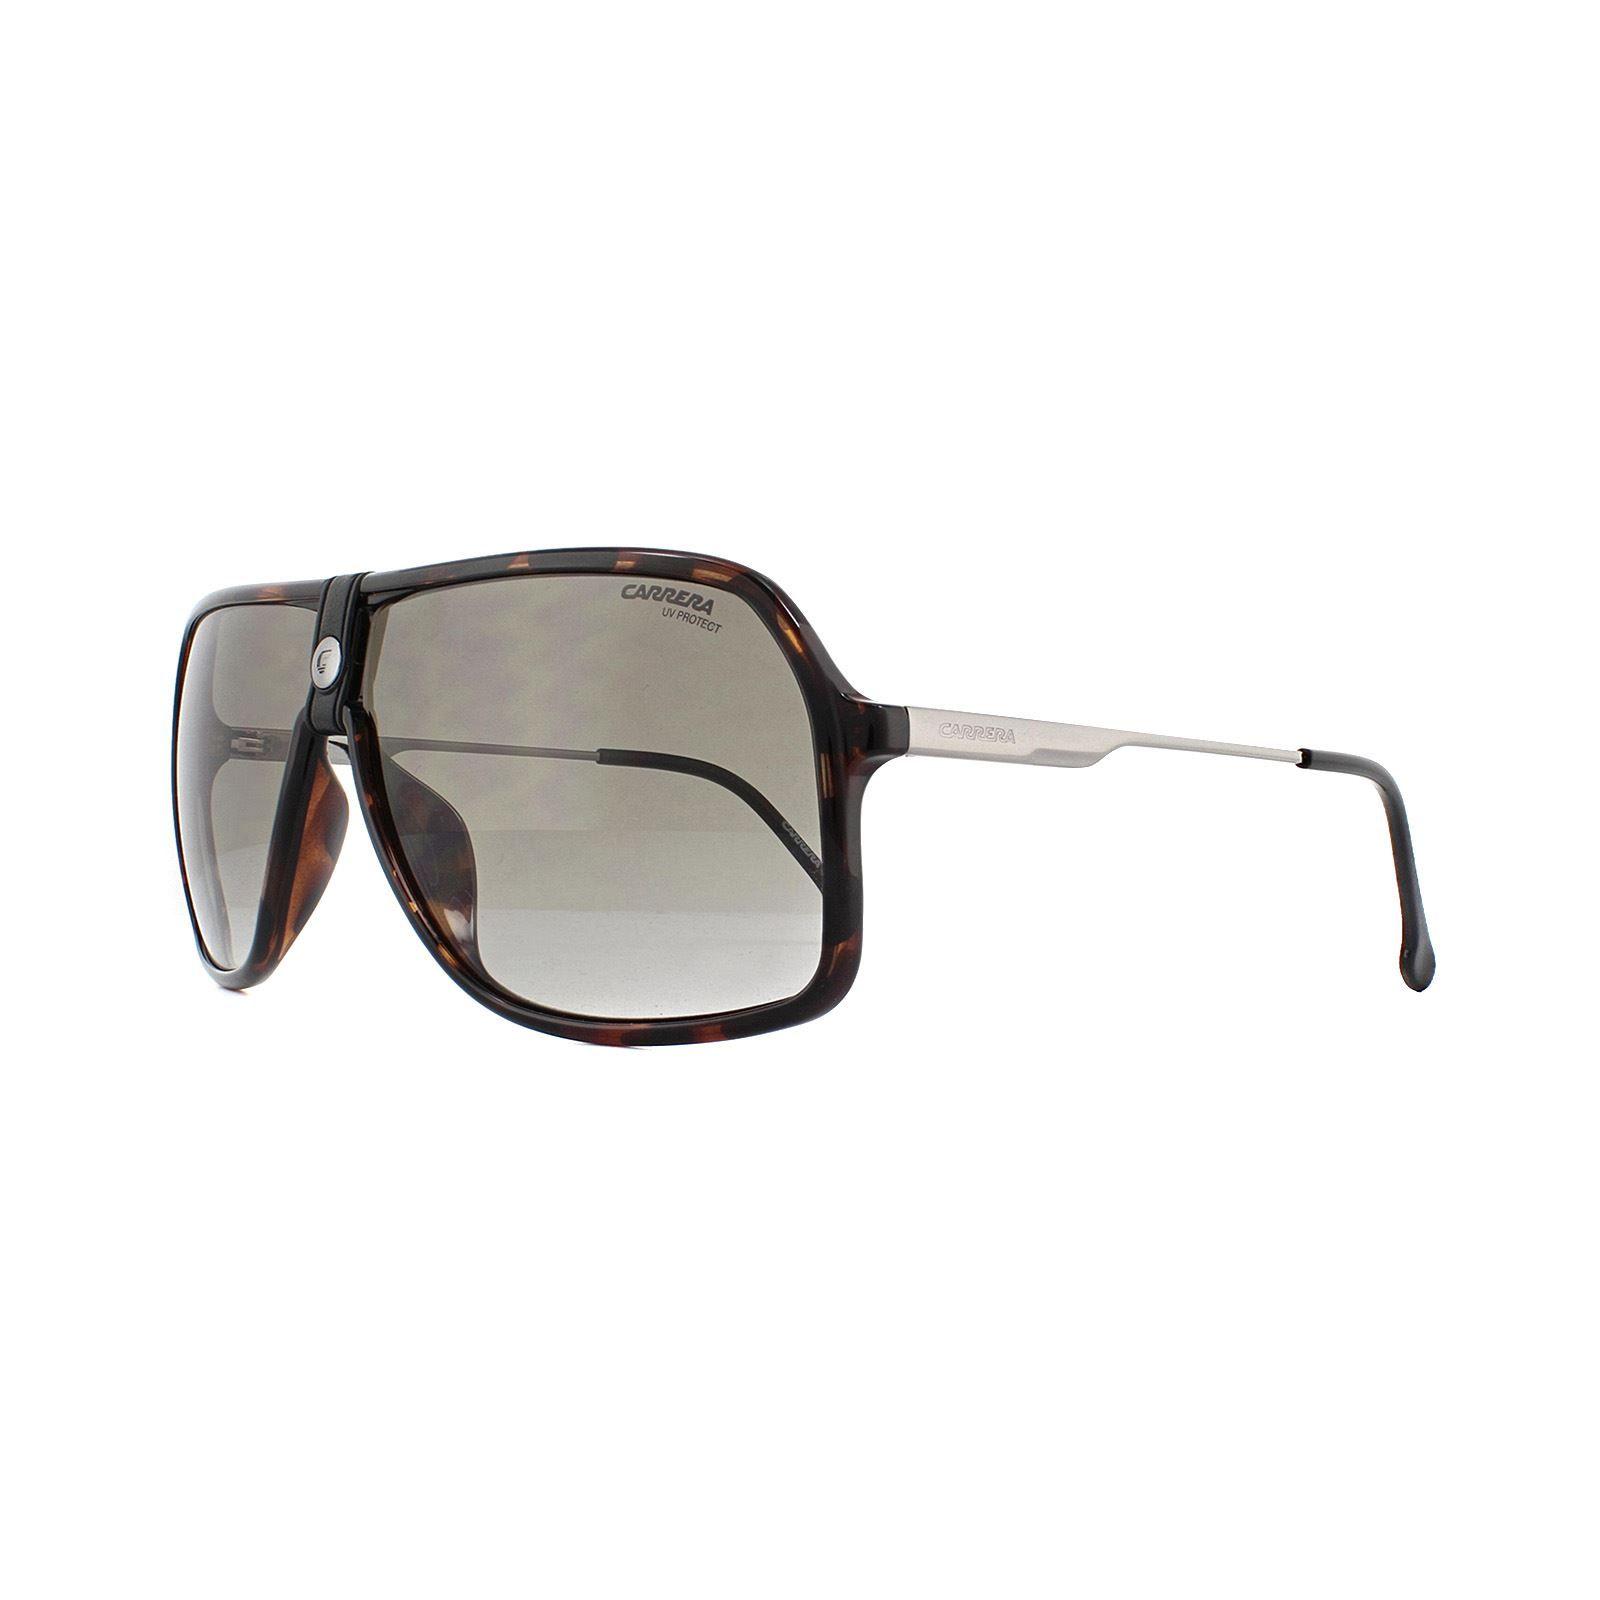 Carrera Sunglasses 1019/S 086 HA Dark Havana Brown Gradient